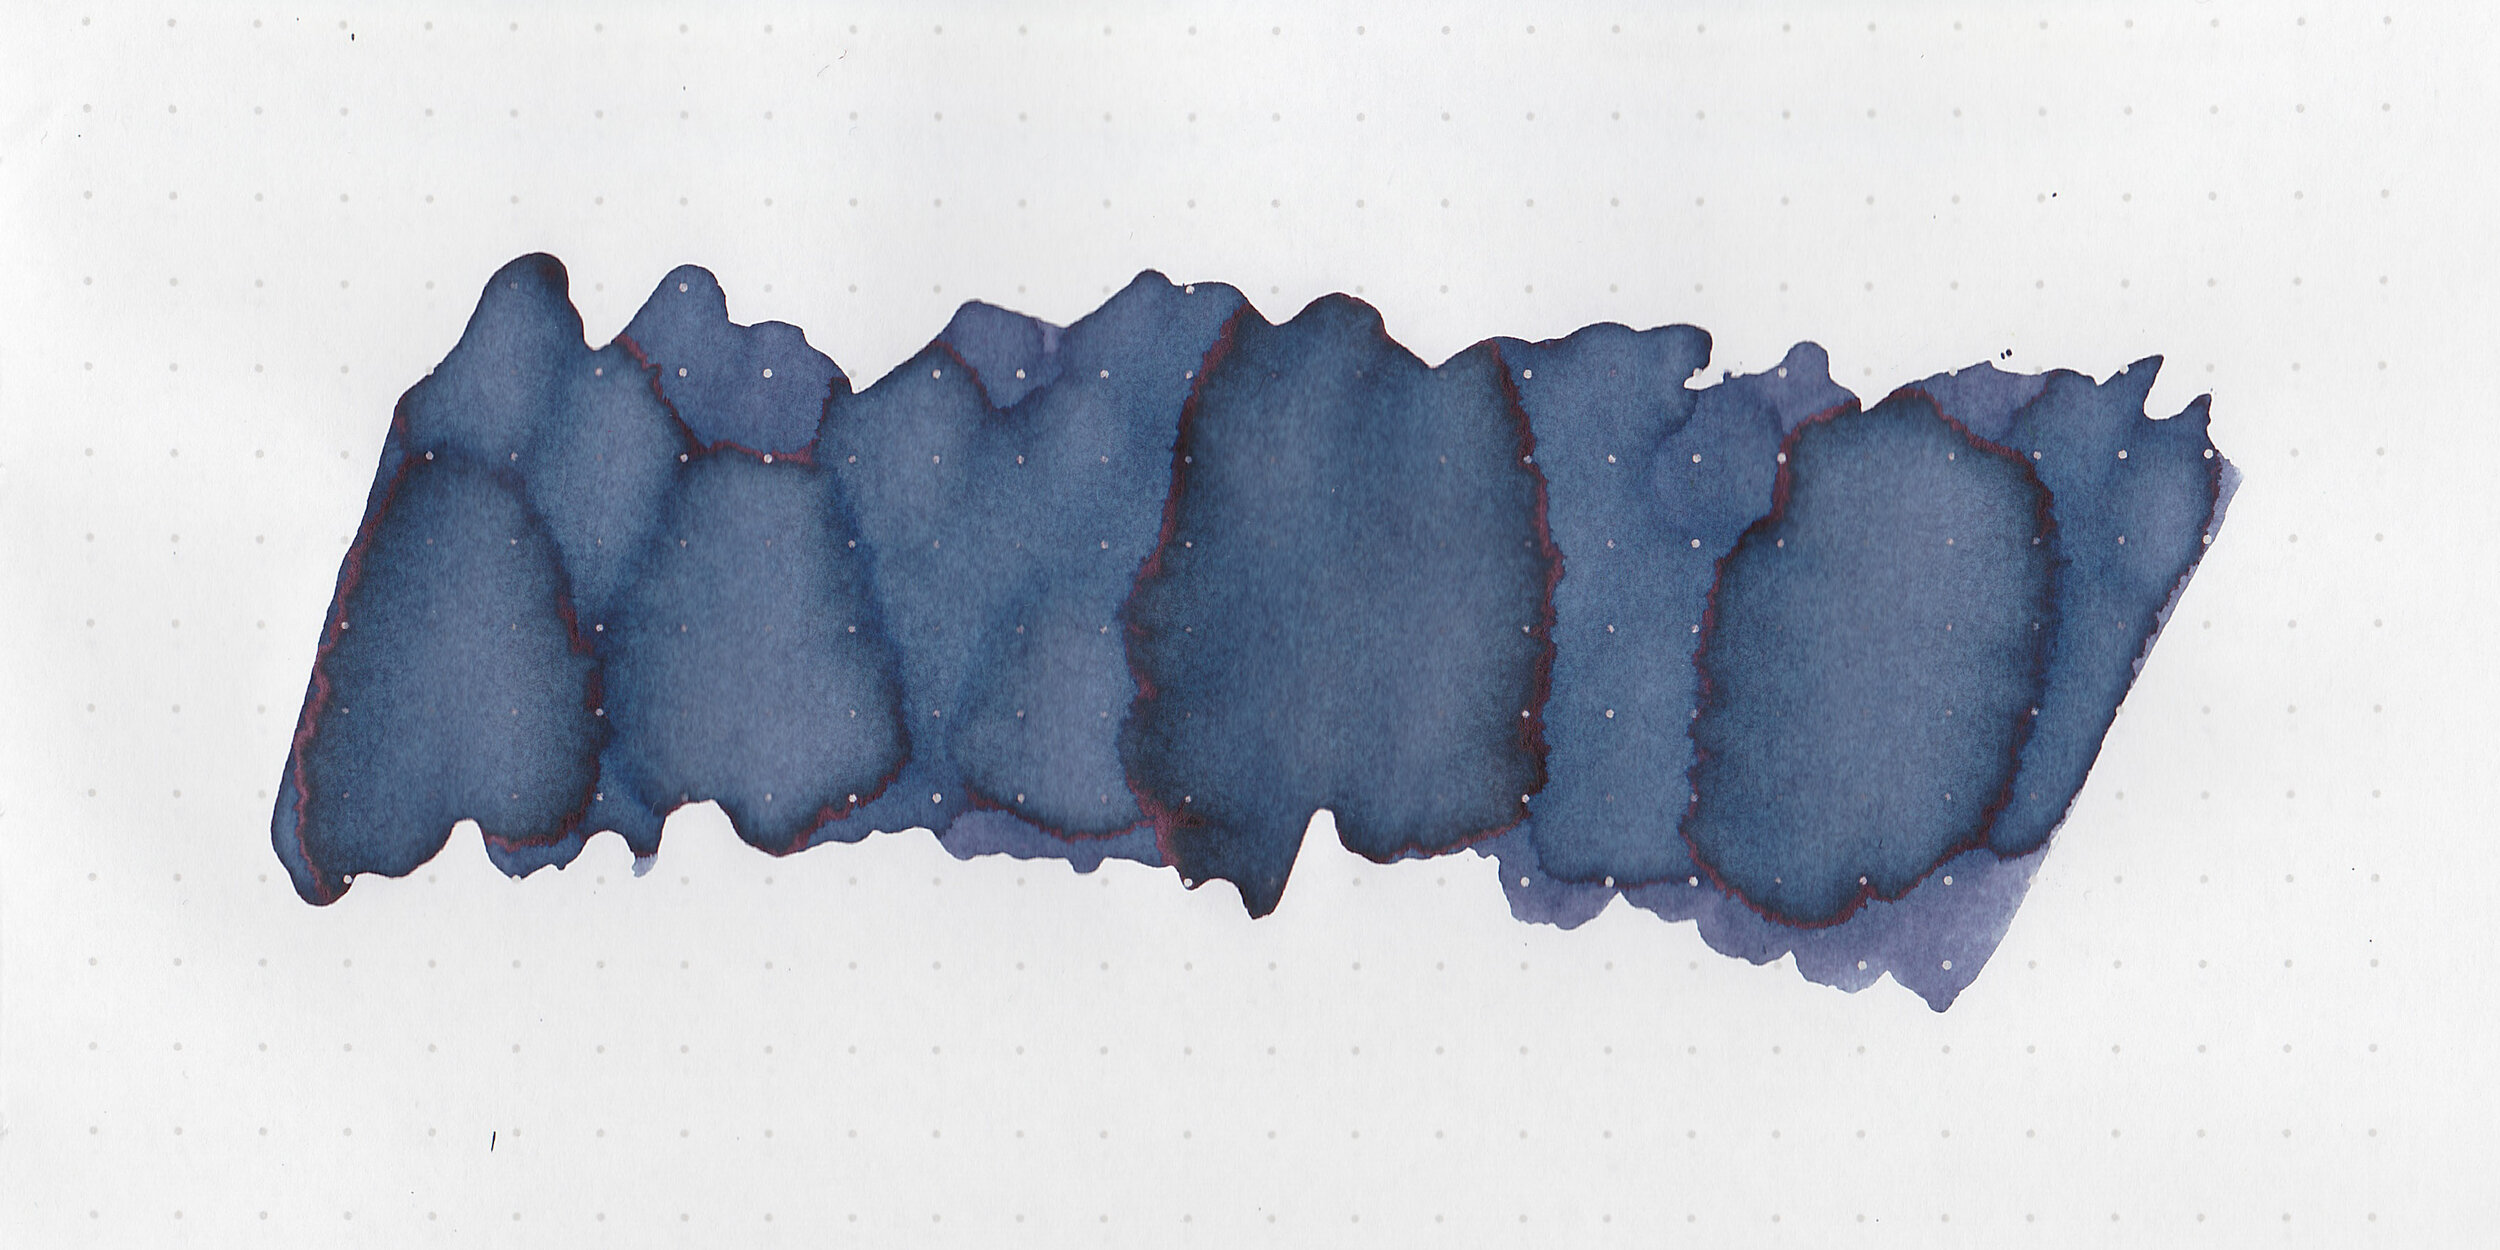 mv-blue-black-6.jpg